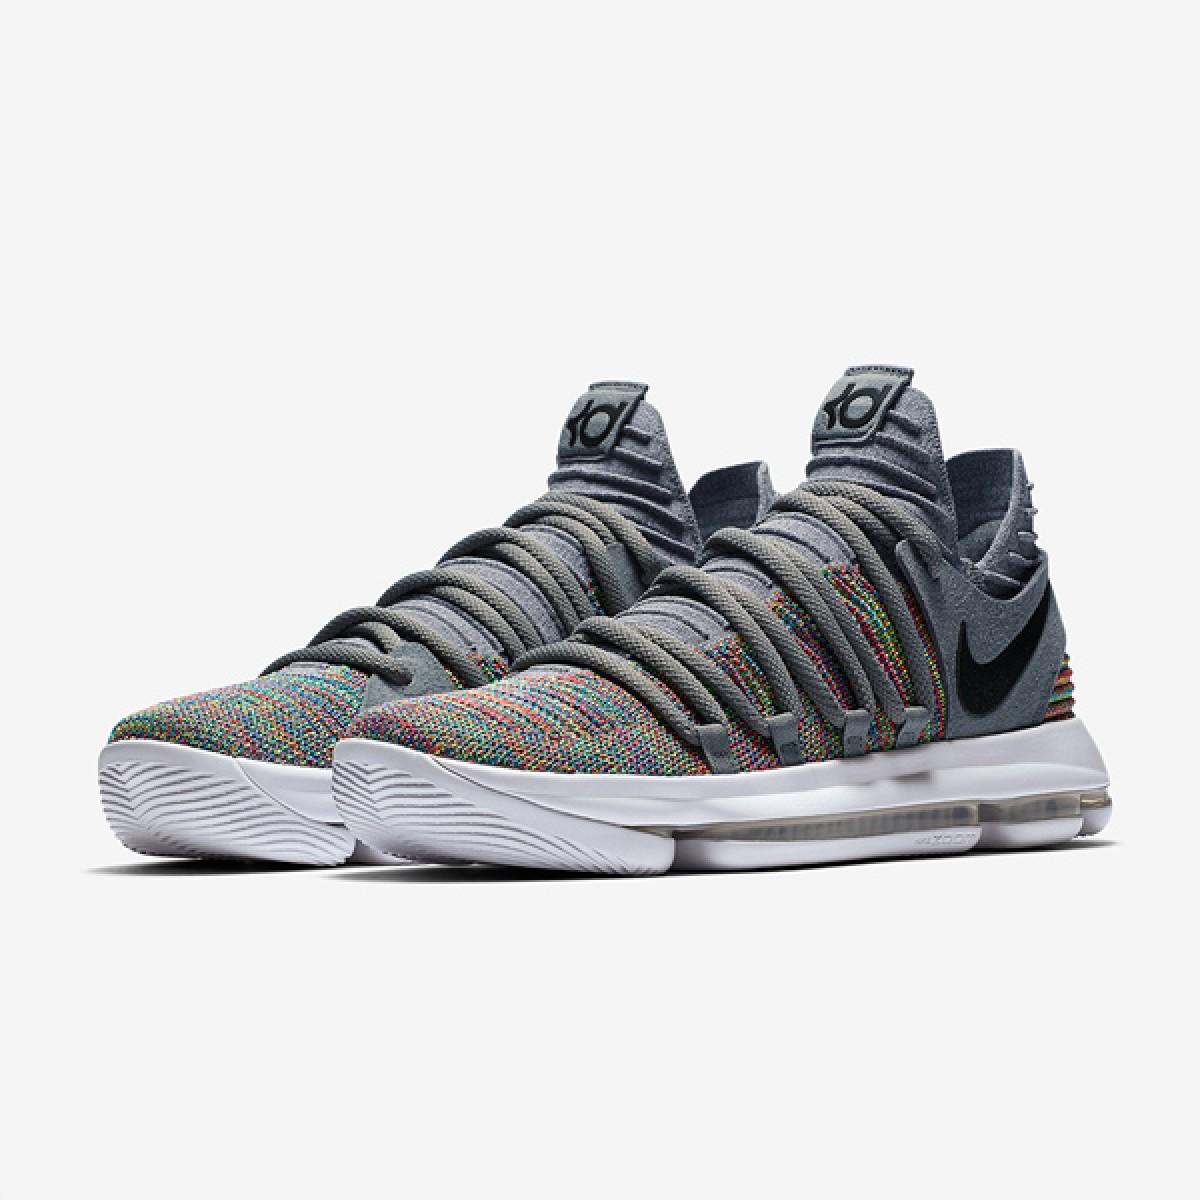 Nike Zoom KD 10 'Multicolor'-897815-900